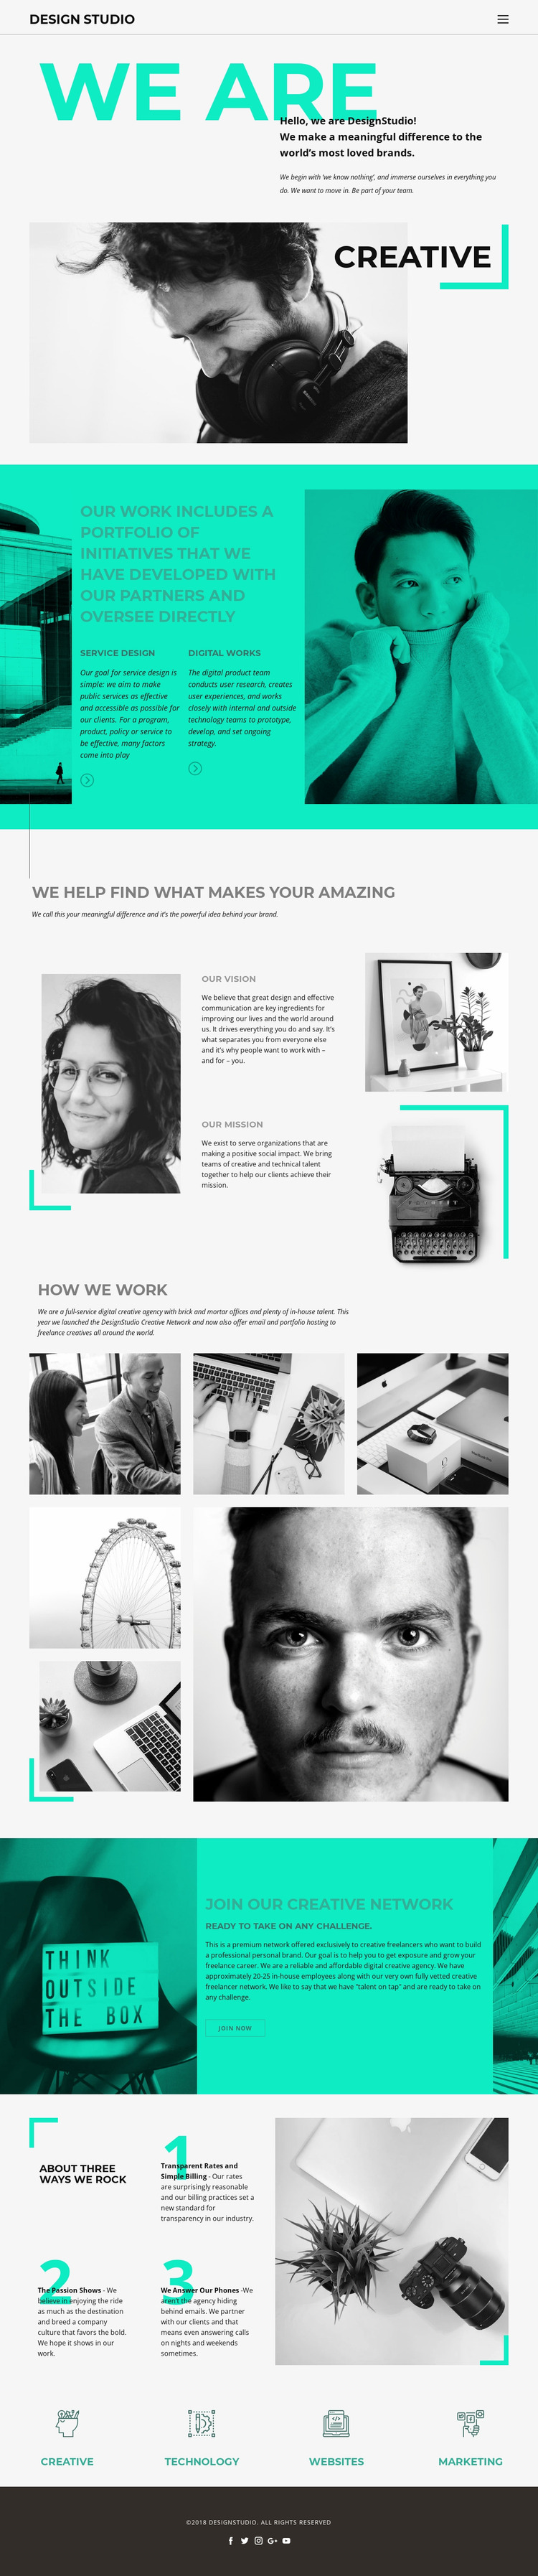 We are creative business Website Mockup